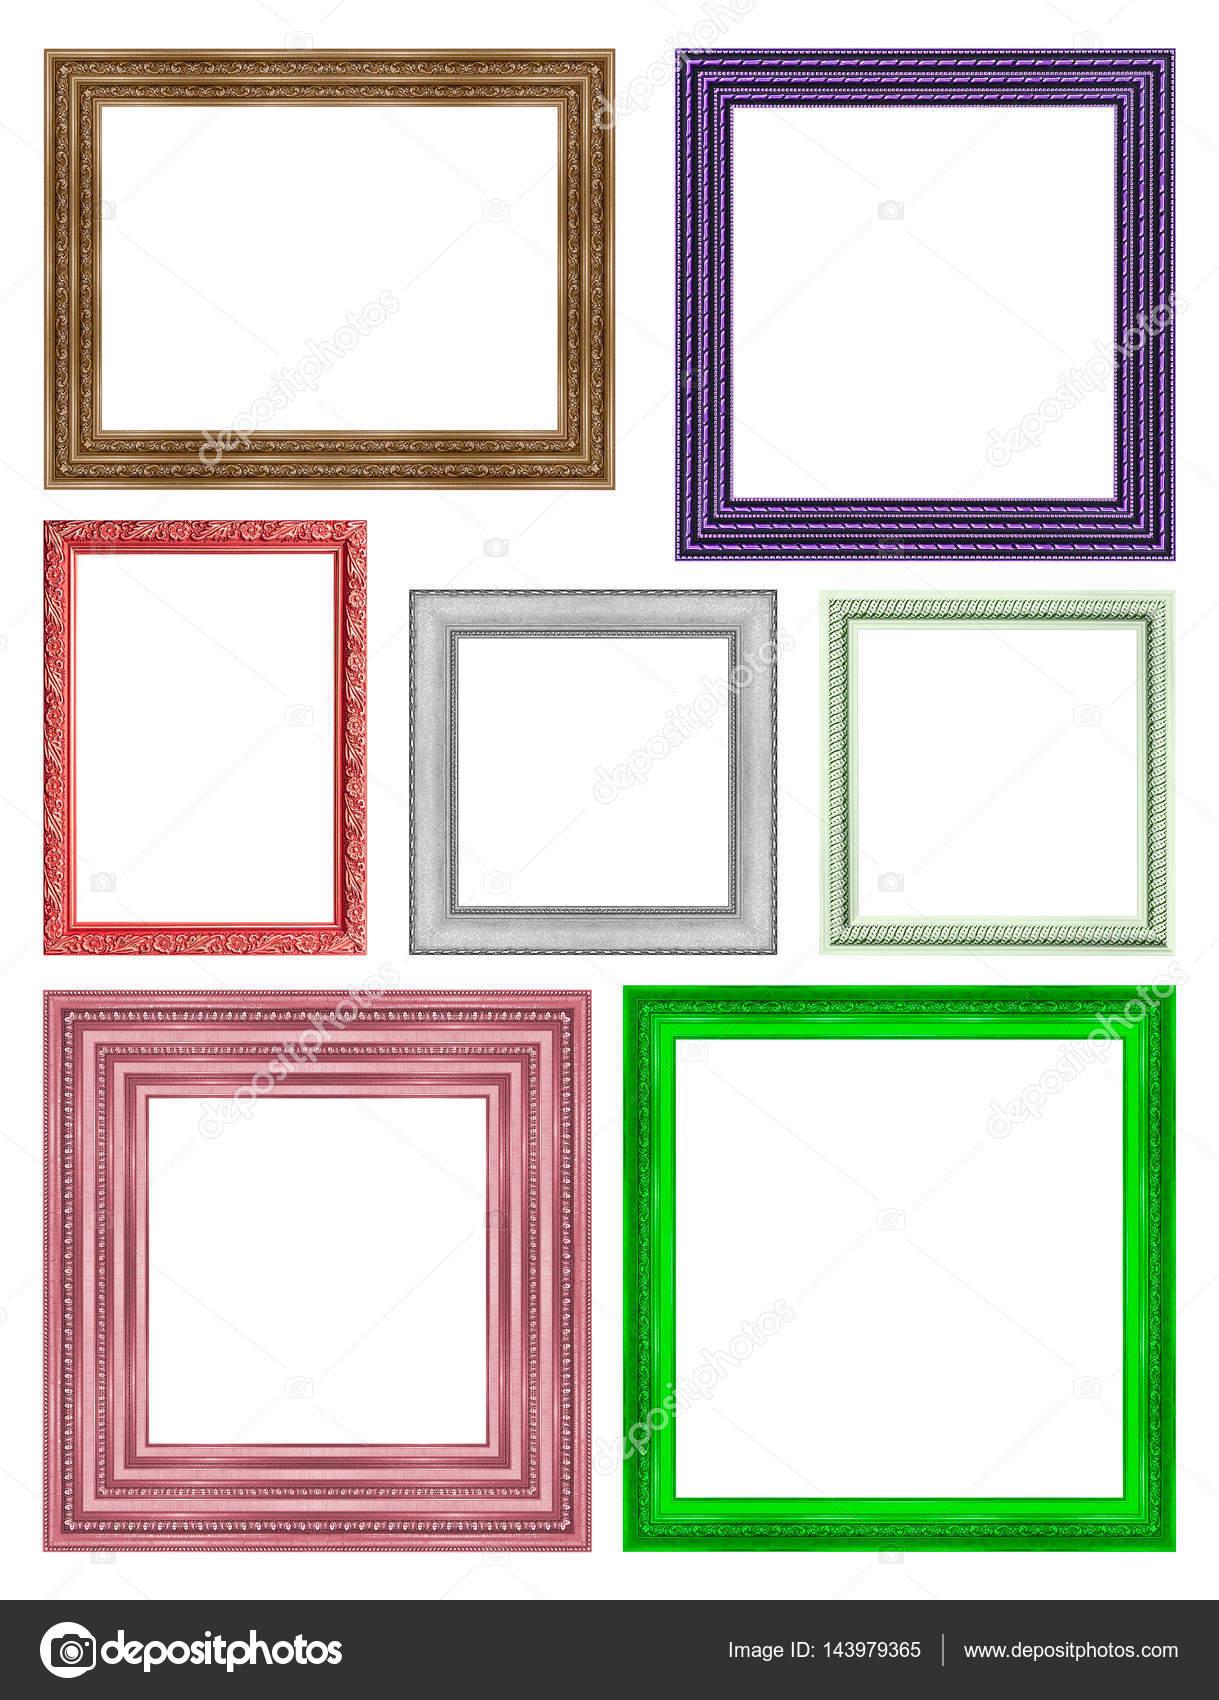 marco cuadro marco madera tallada patrón aislado en un blanco ba ...